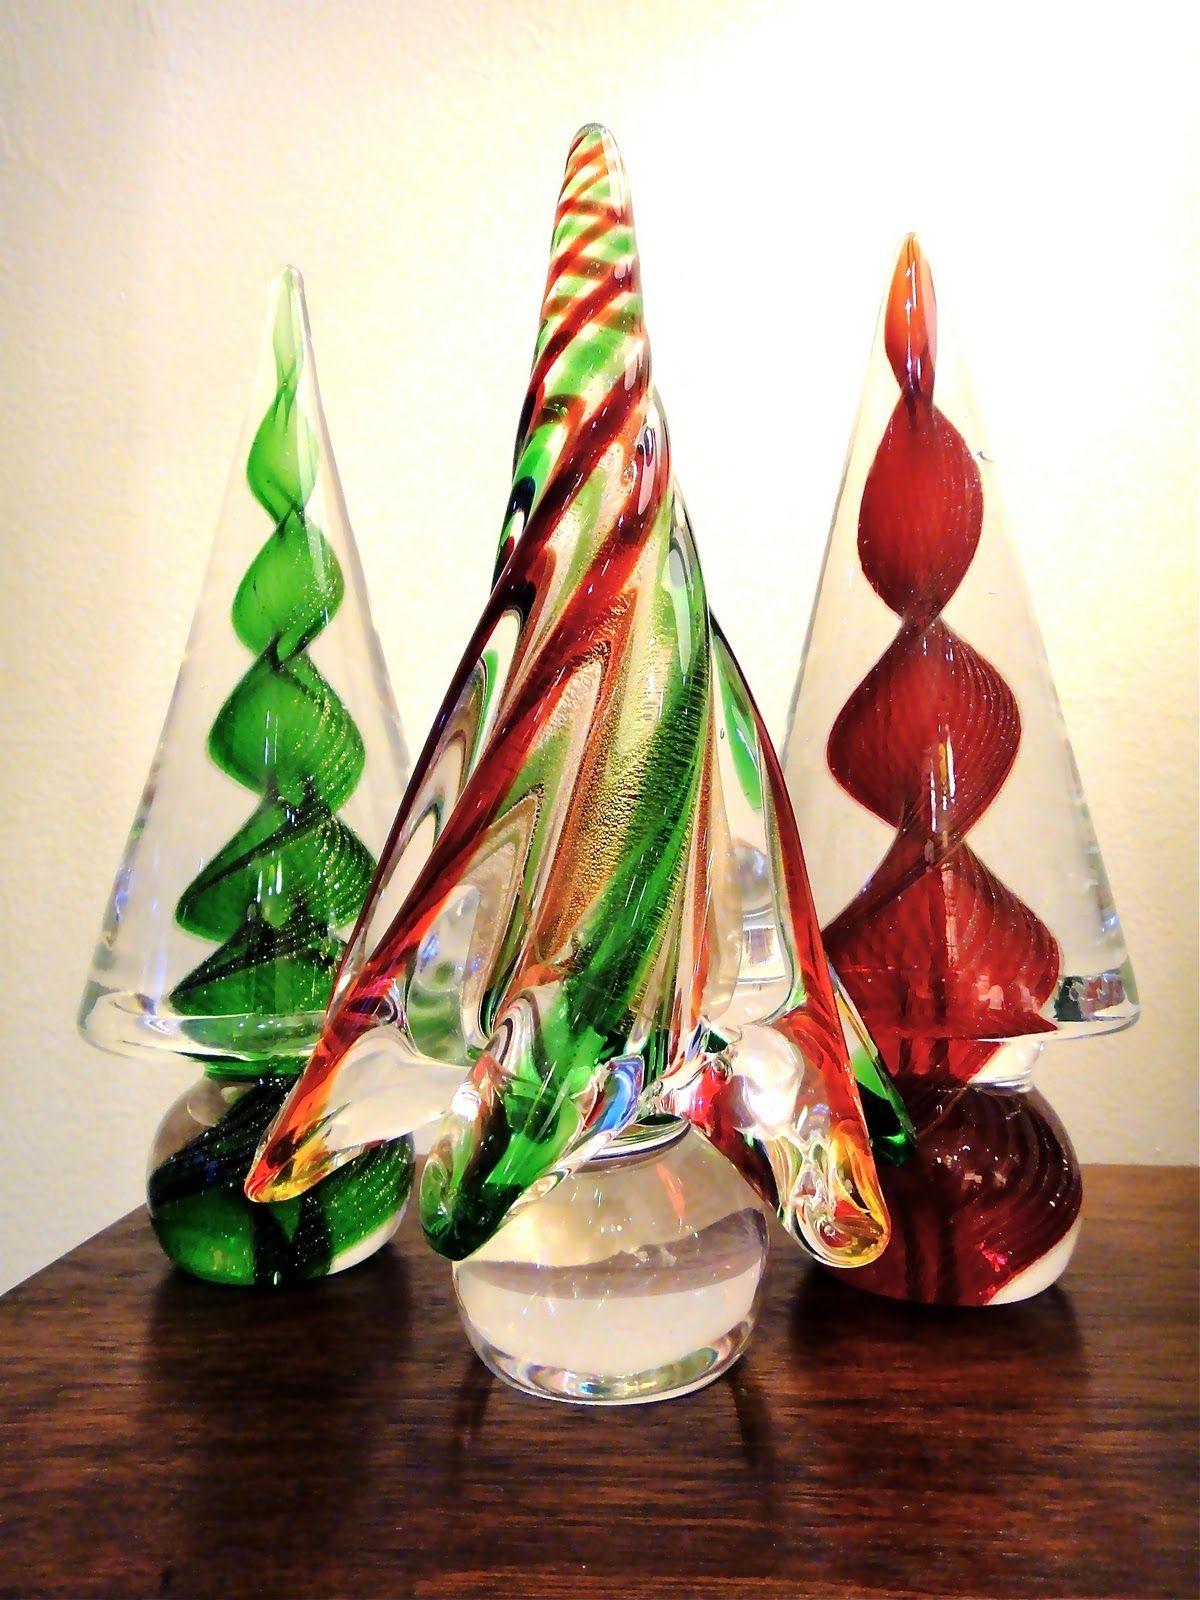 Murano glass christmas trees art glass from venice italy - Murano glass christmas tree ...